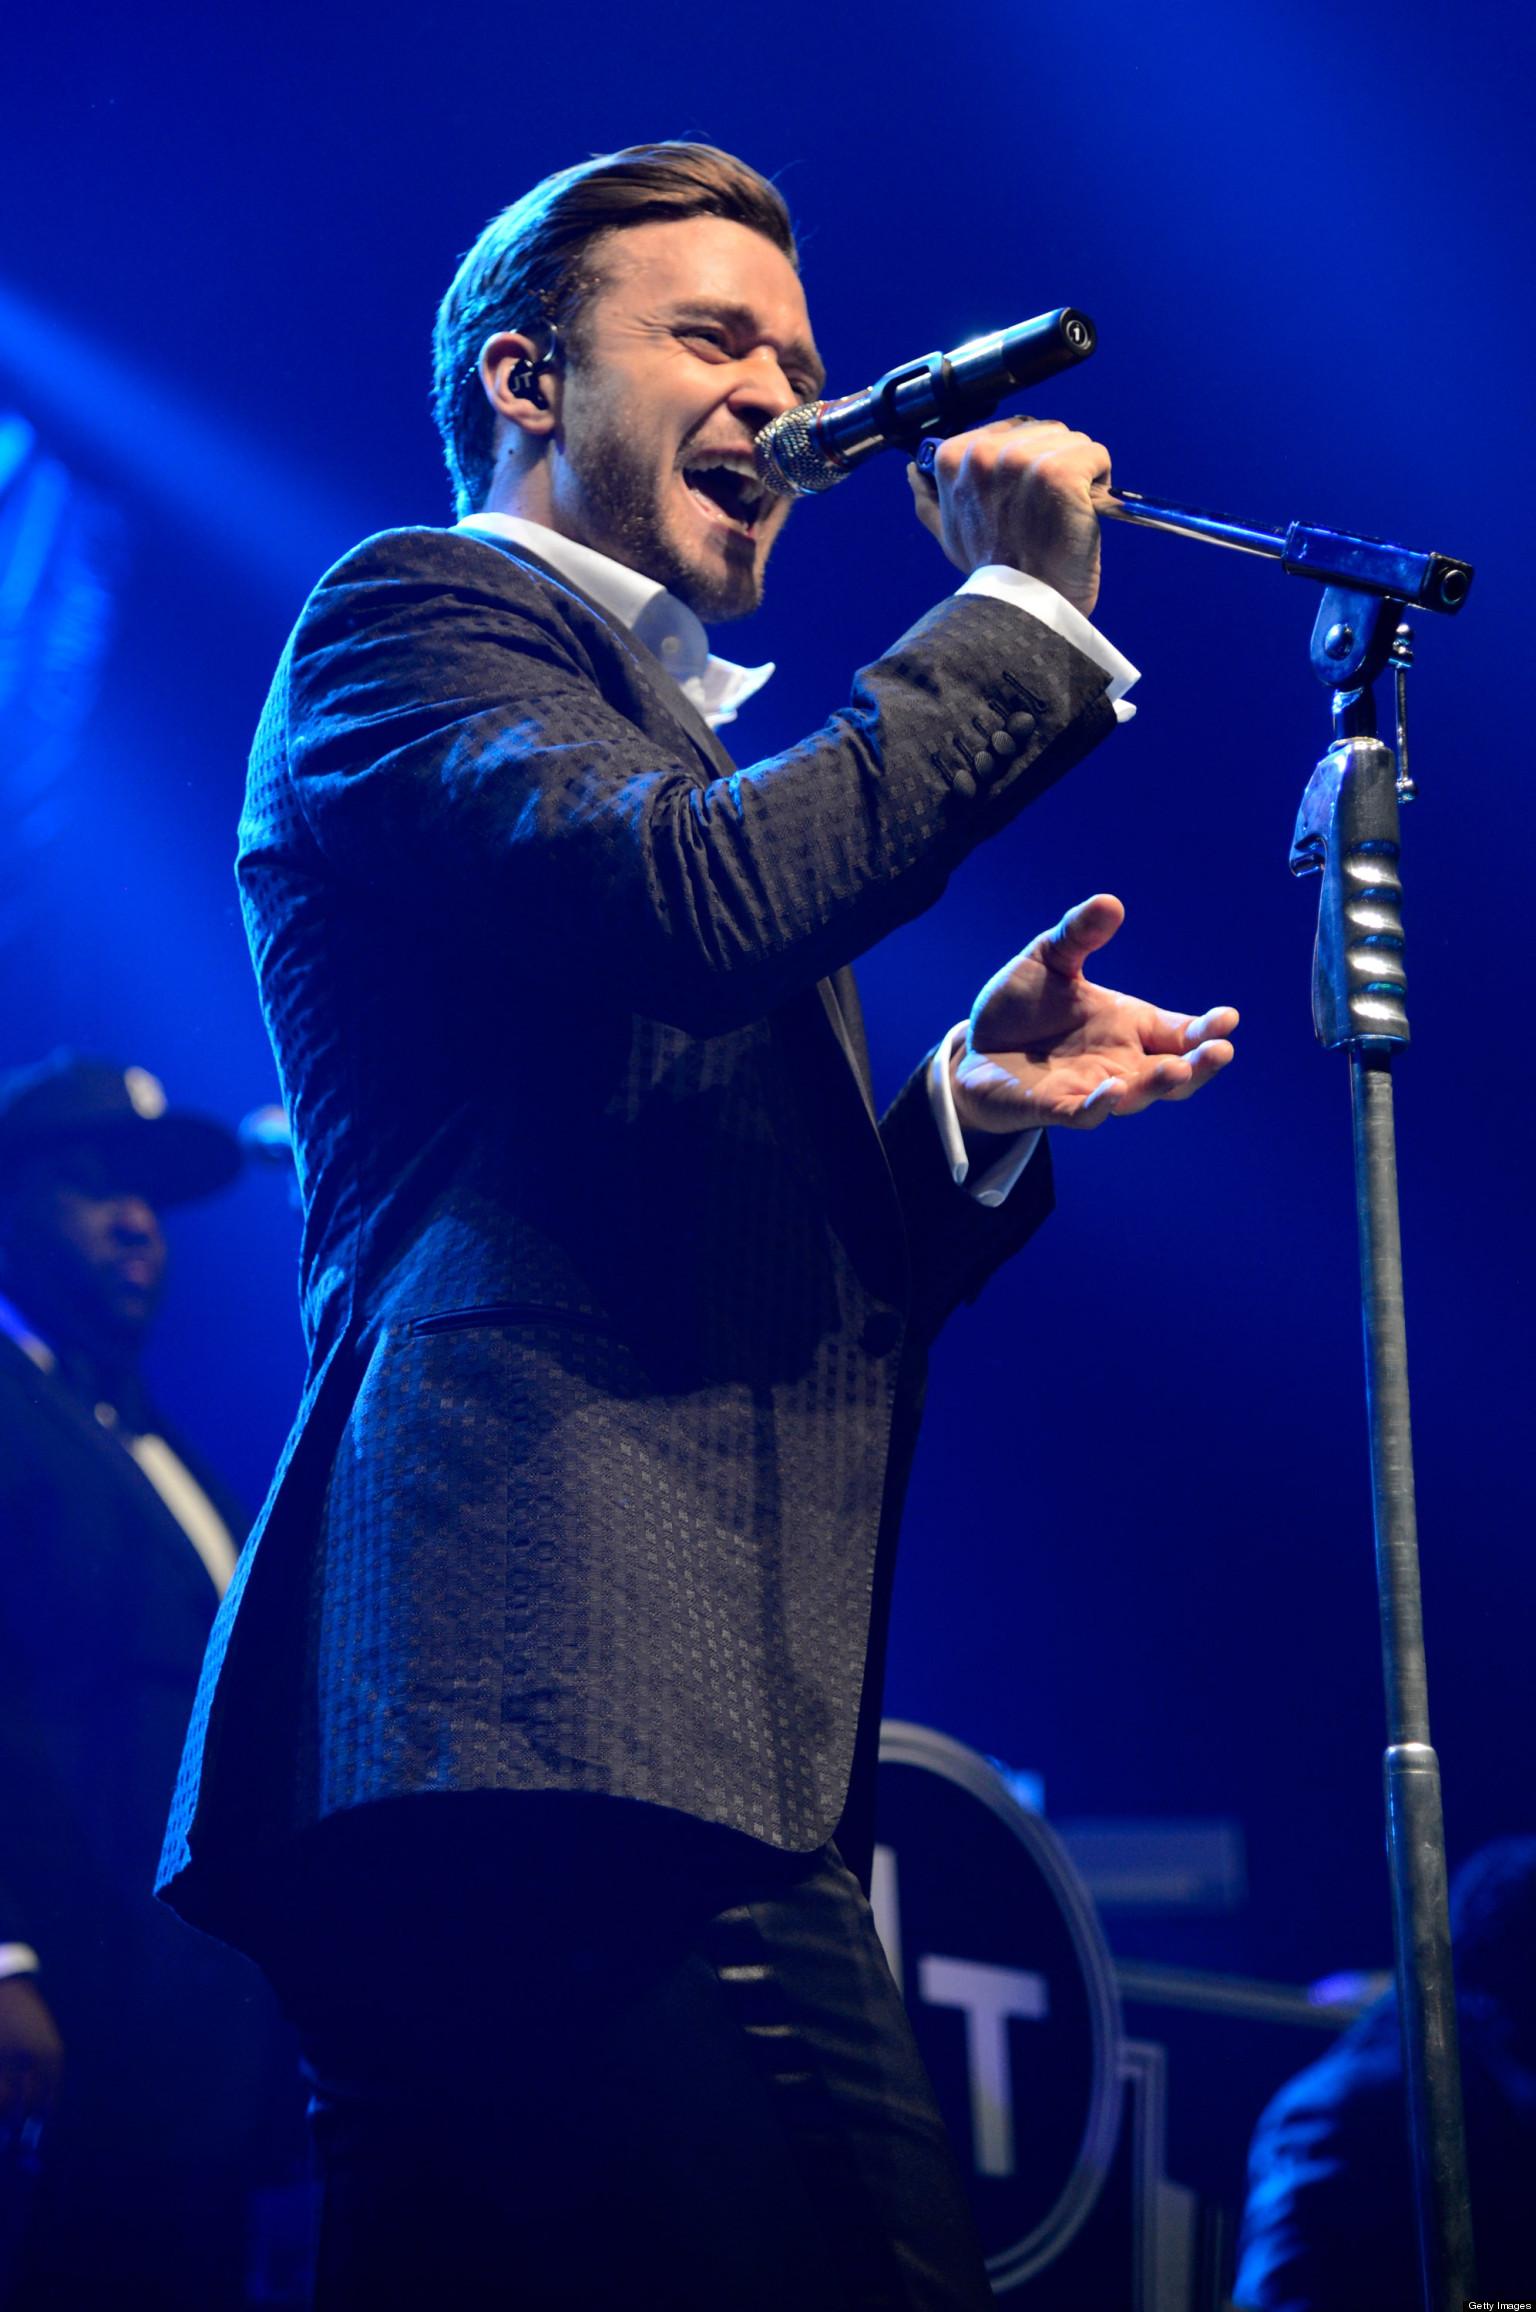 Justin Timberlake Rocks At Star-Studded New York Show